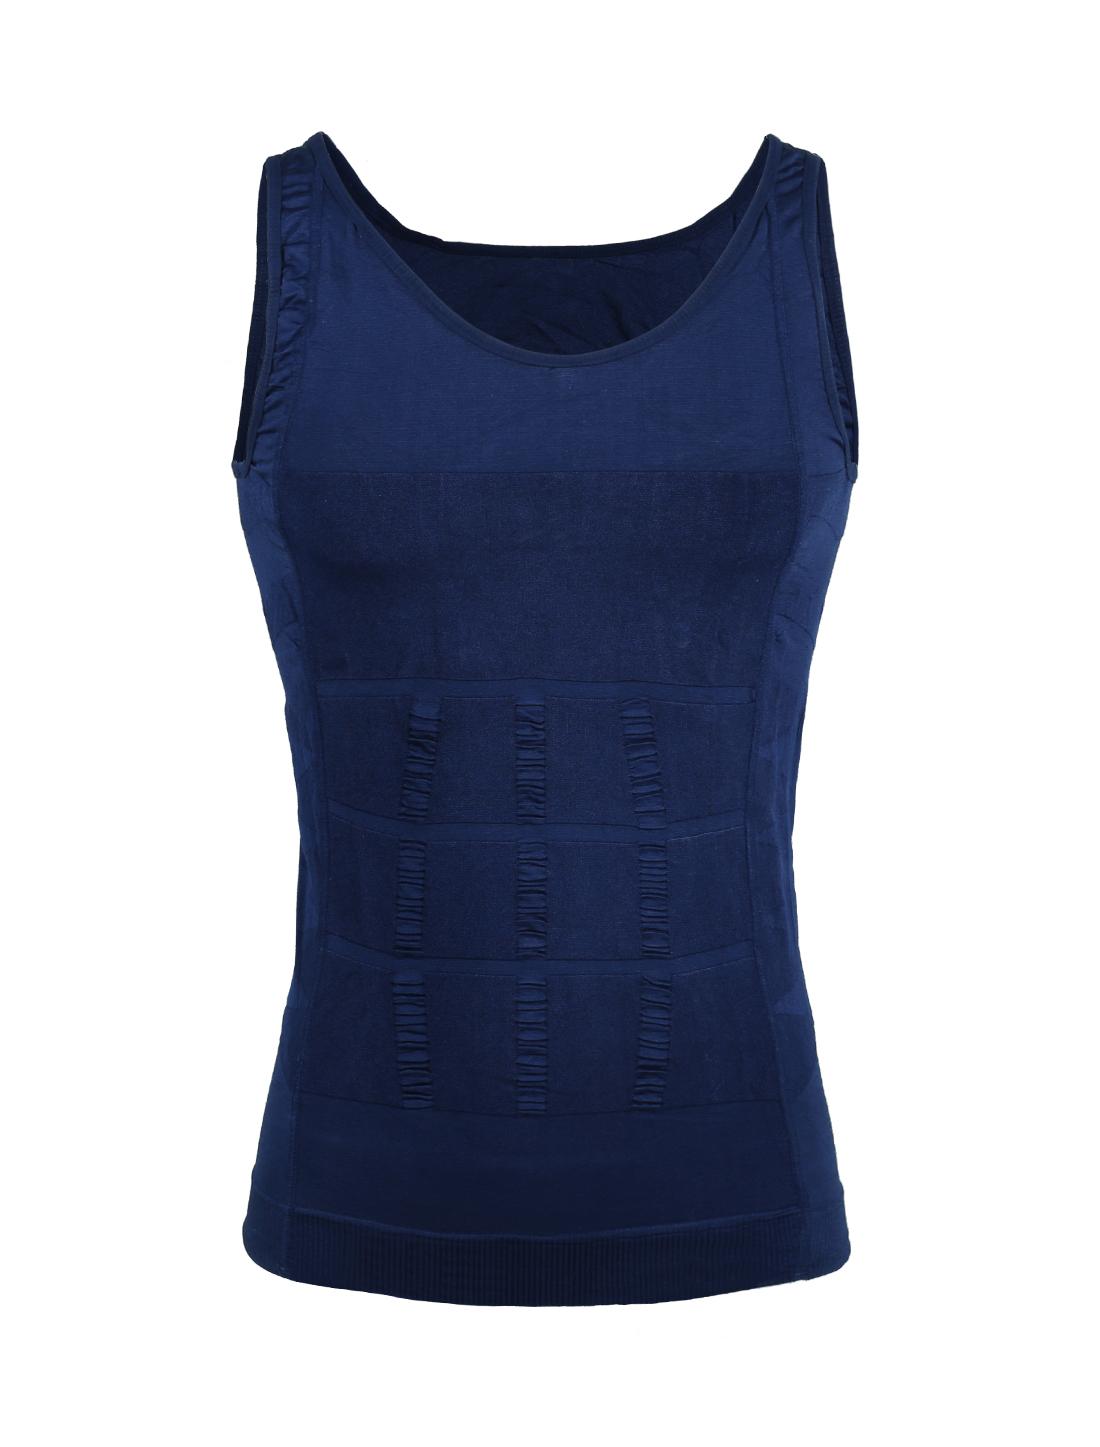 Men Compression Slimming Body Tummy Waist Shapewear Tank Top Blue XX-Large